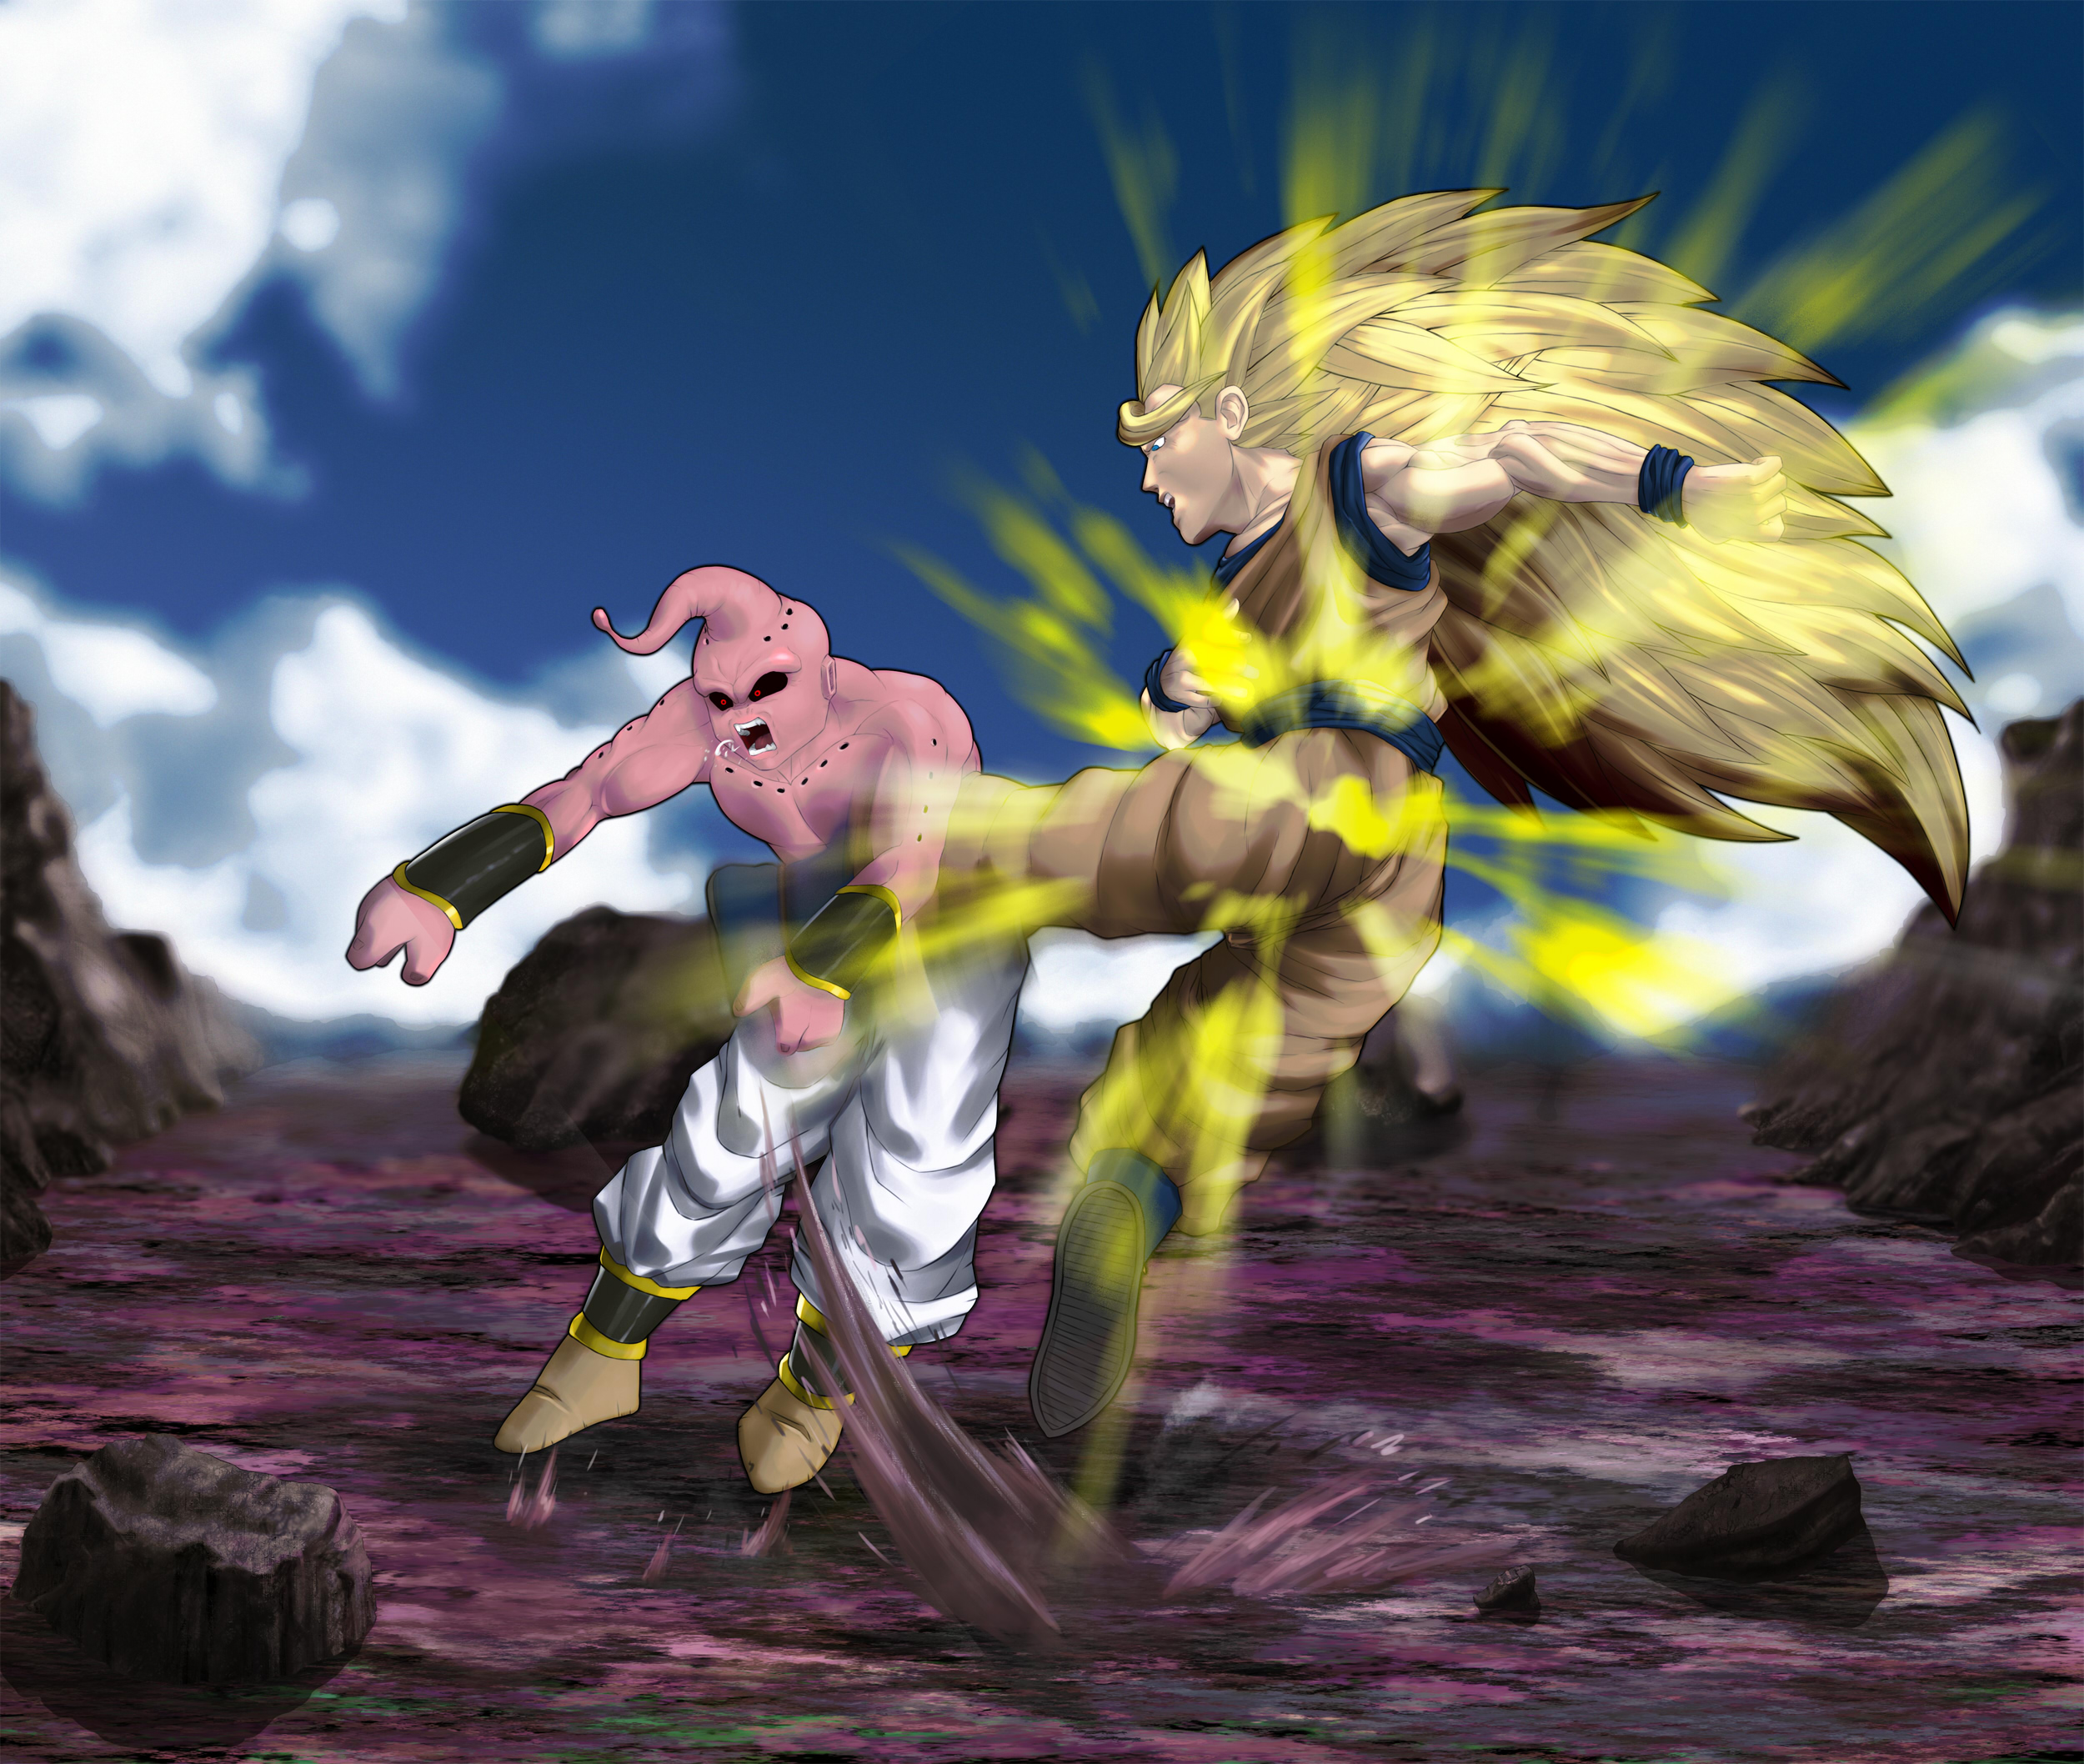 Goku Wallpaper Hd: Goku Vs Buu Full HD Wallpaper And Background Image